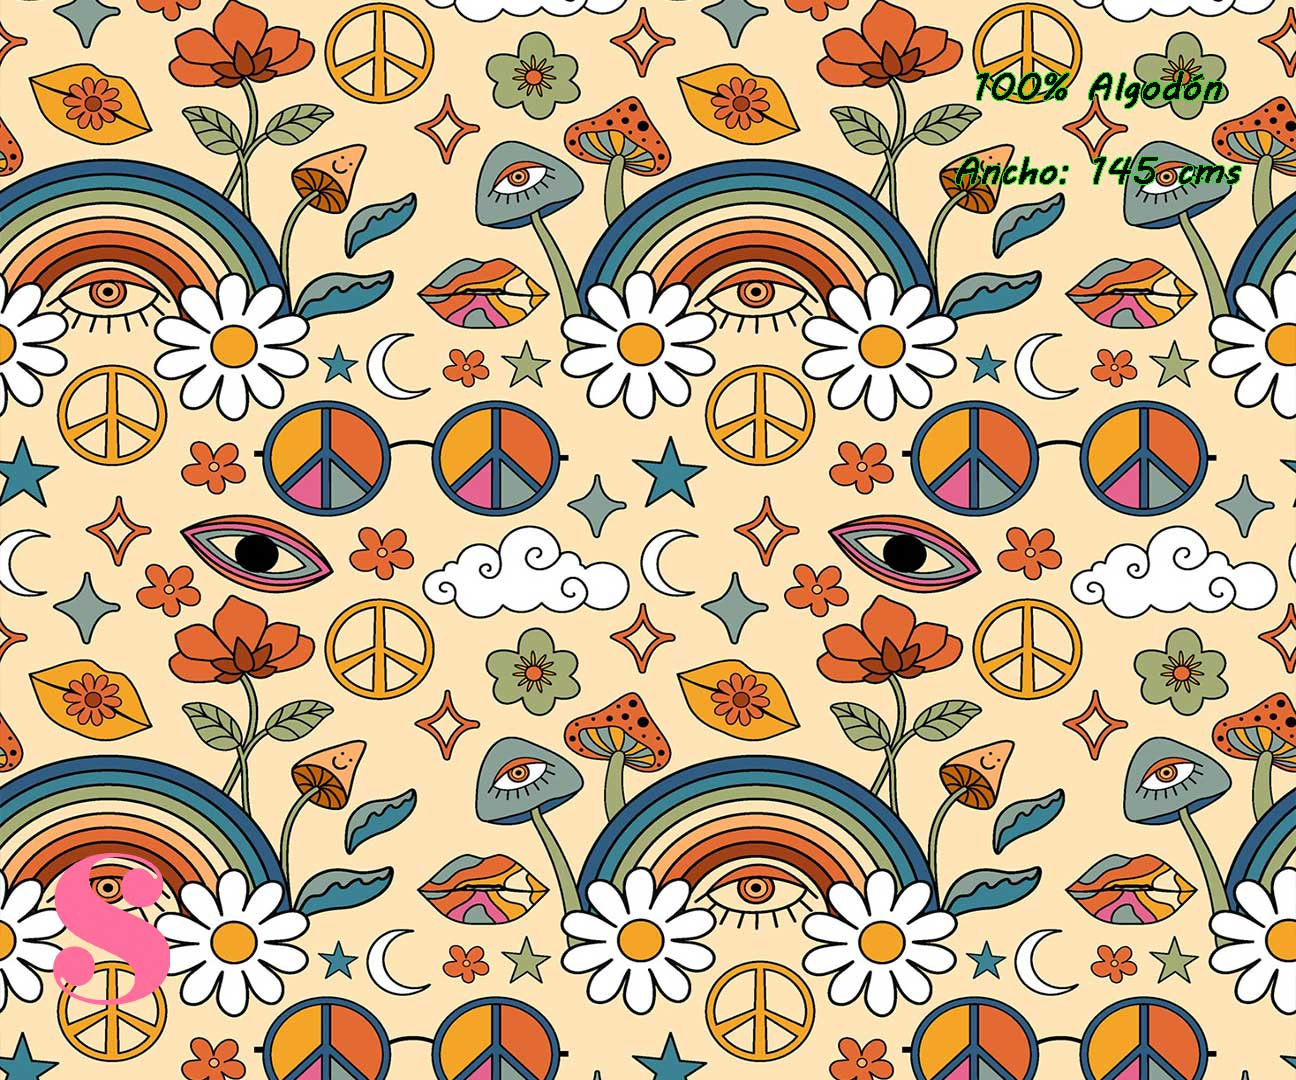 4-telas-infantiles,estampados-infantiles,telas-disney,telas-con-licencia,telas-estampadas-frikis,telas-por-metros,Tejido Estampado Boho Hippie